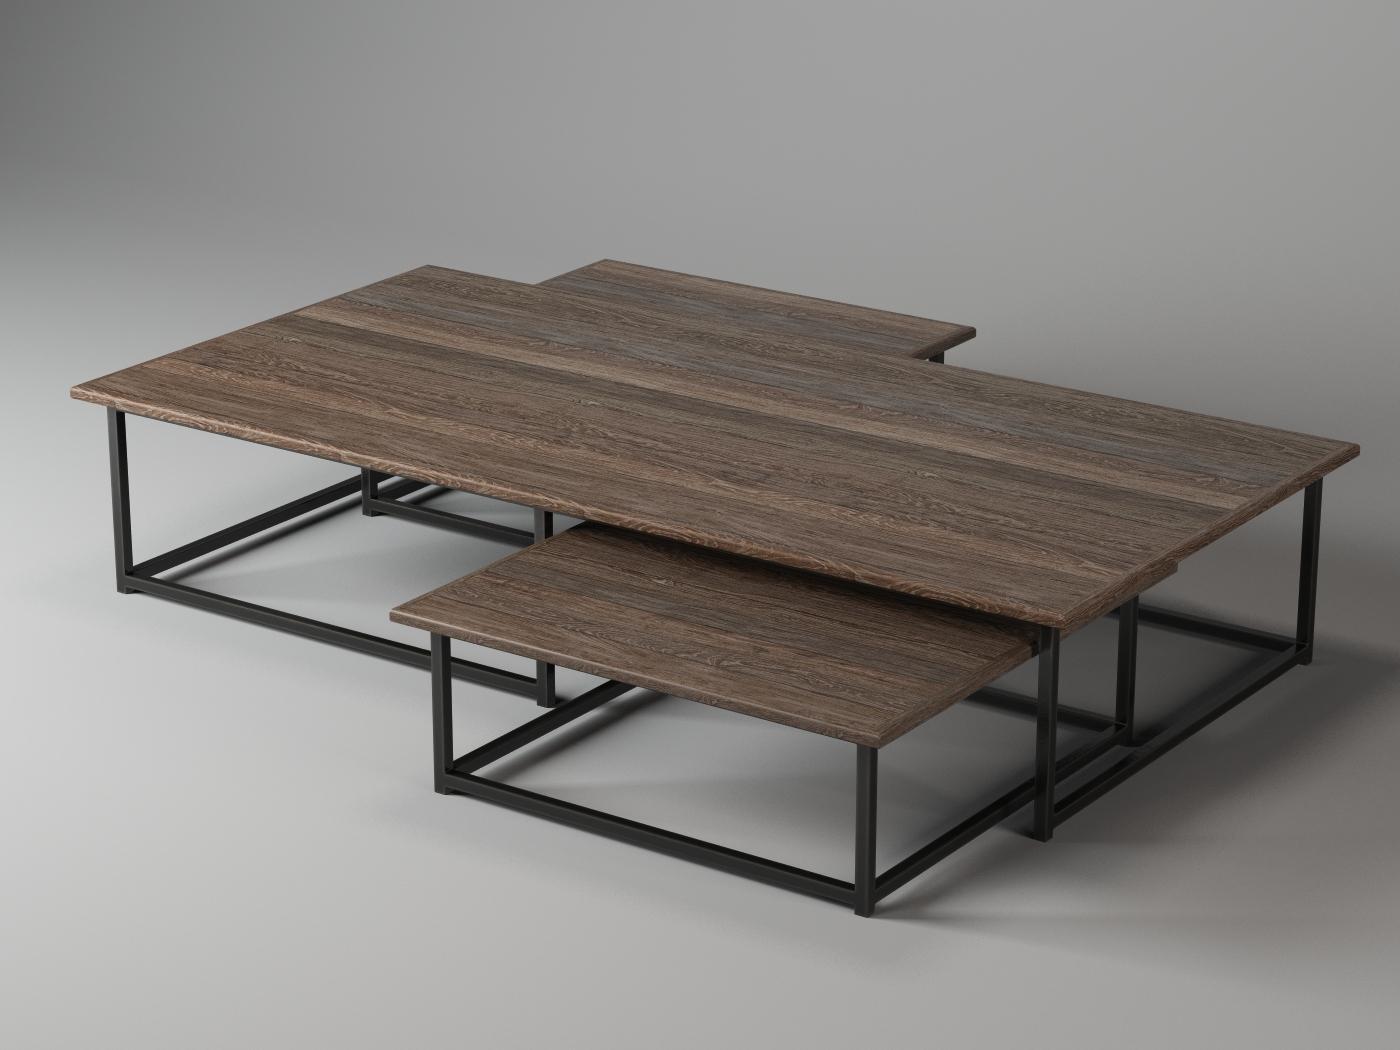 Flamant Basse Table 3 Alvia Pièces hdBoCtQrxs